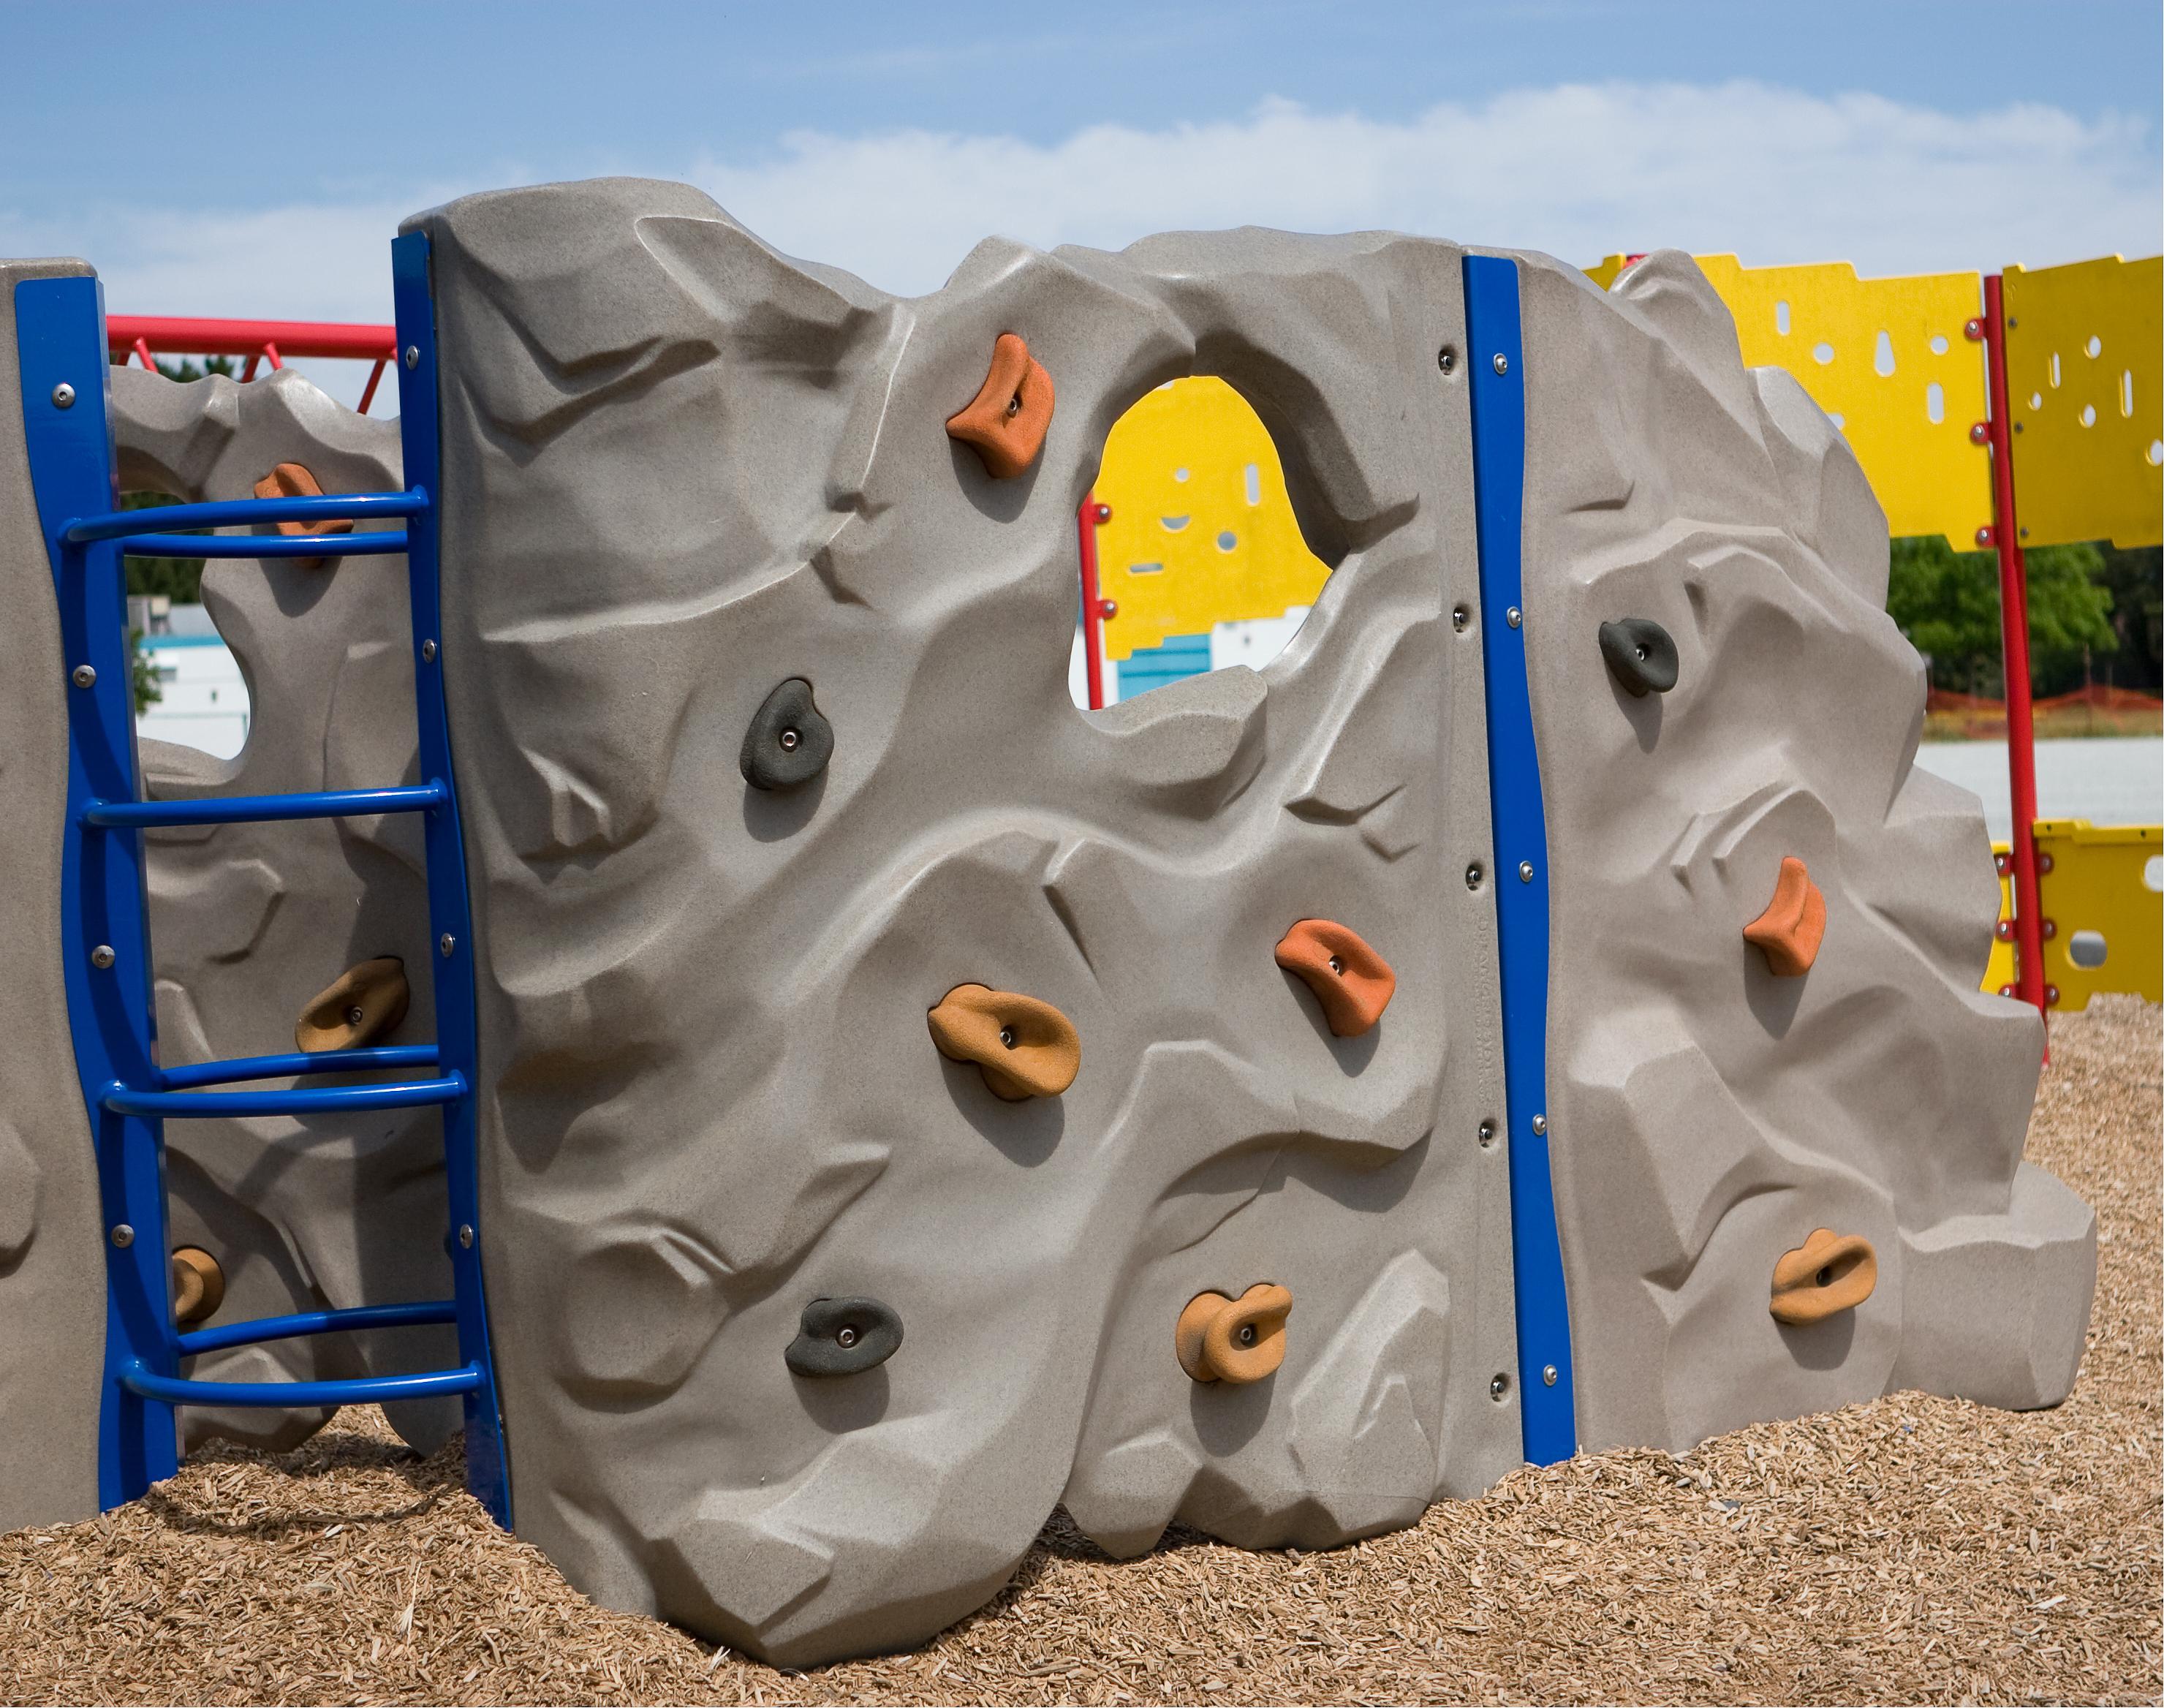 Make a climbing wall